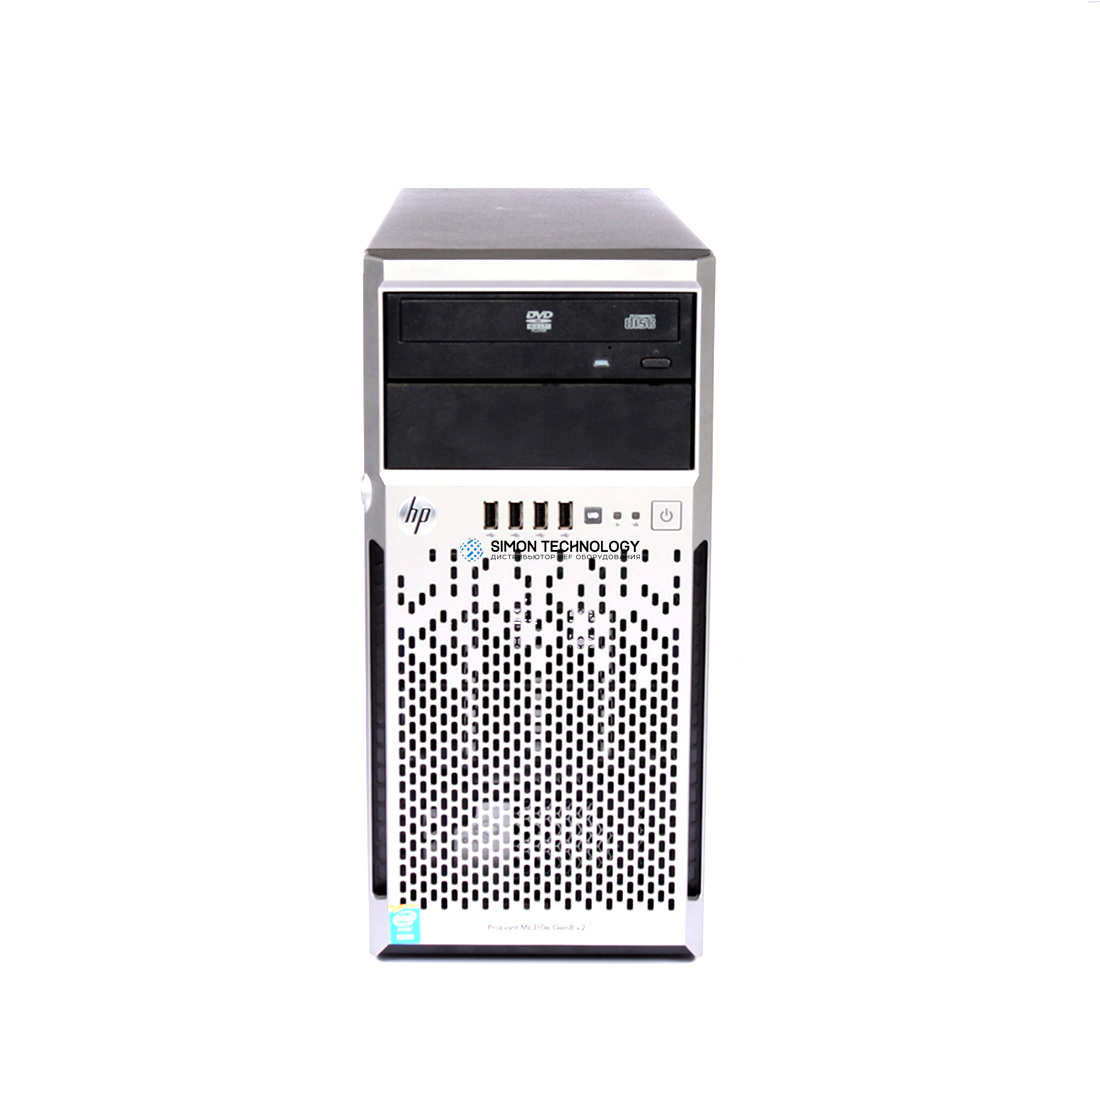 Сервер HP ML310e G8 4LFF CTO Tower Server (722446-B21)